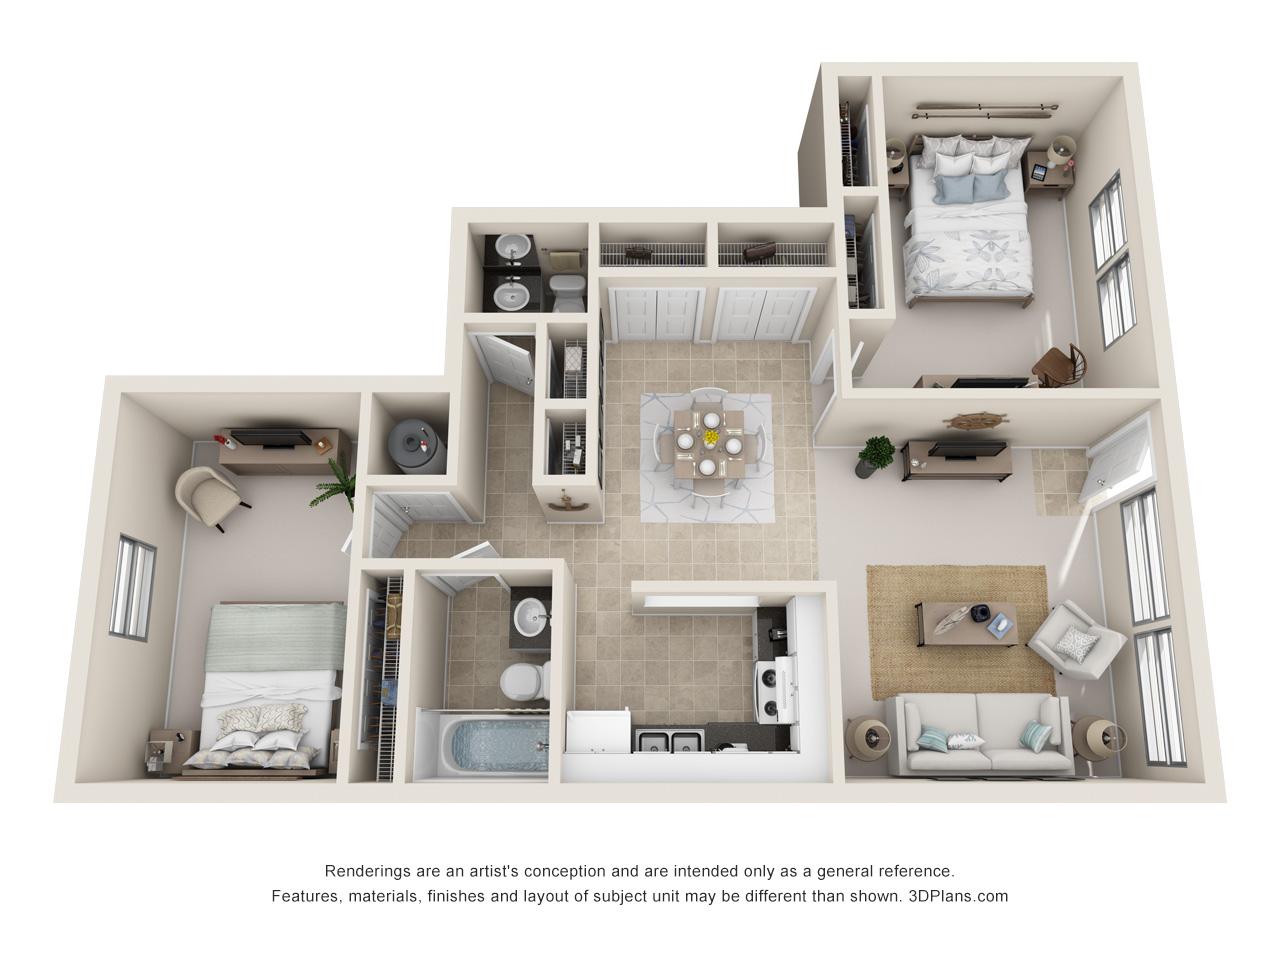 2 bedroom fort lauderdale apartment